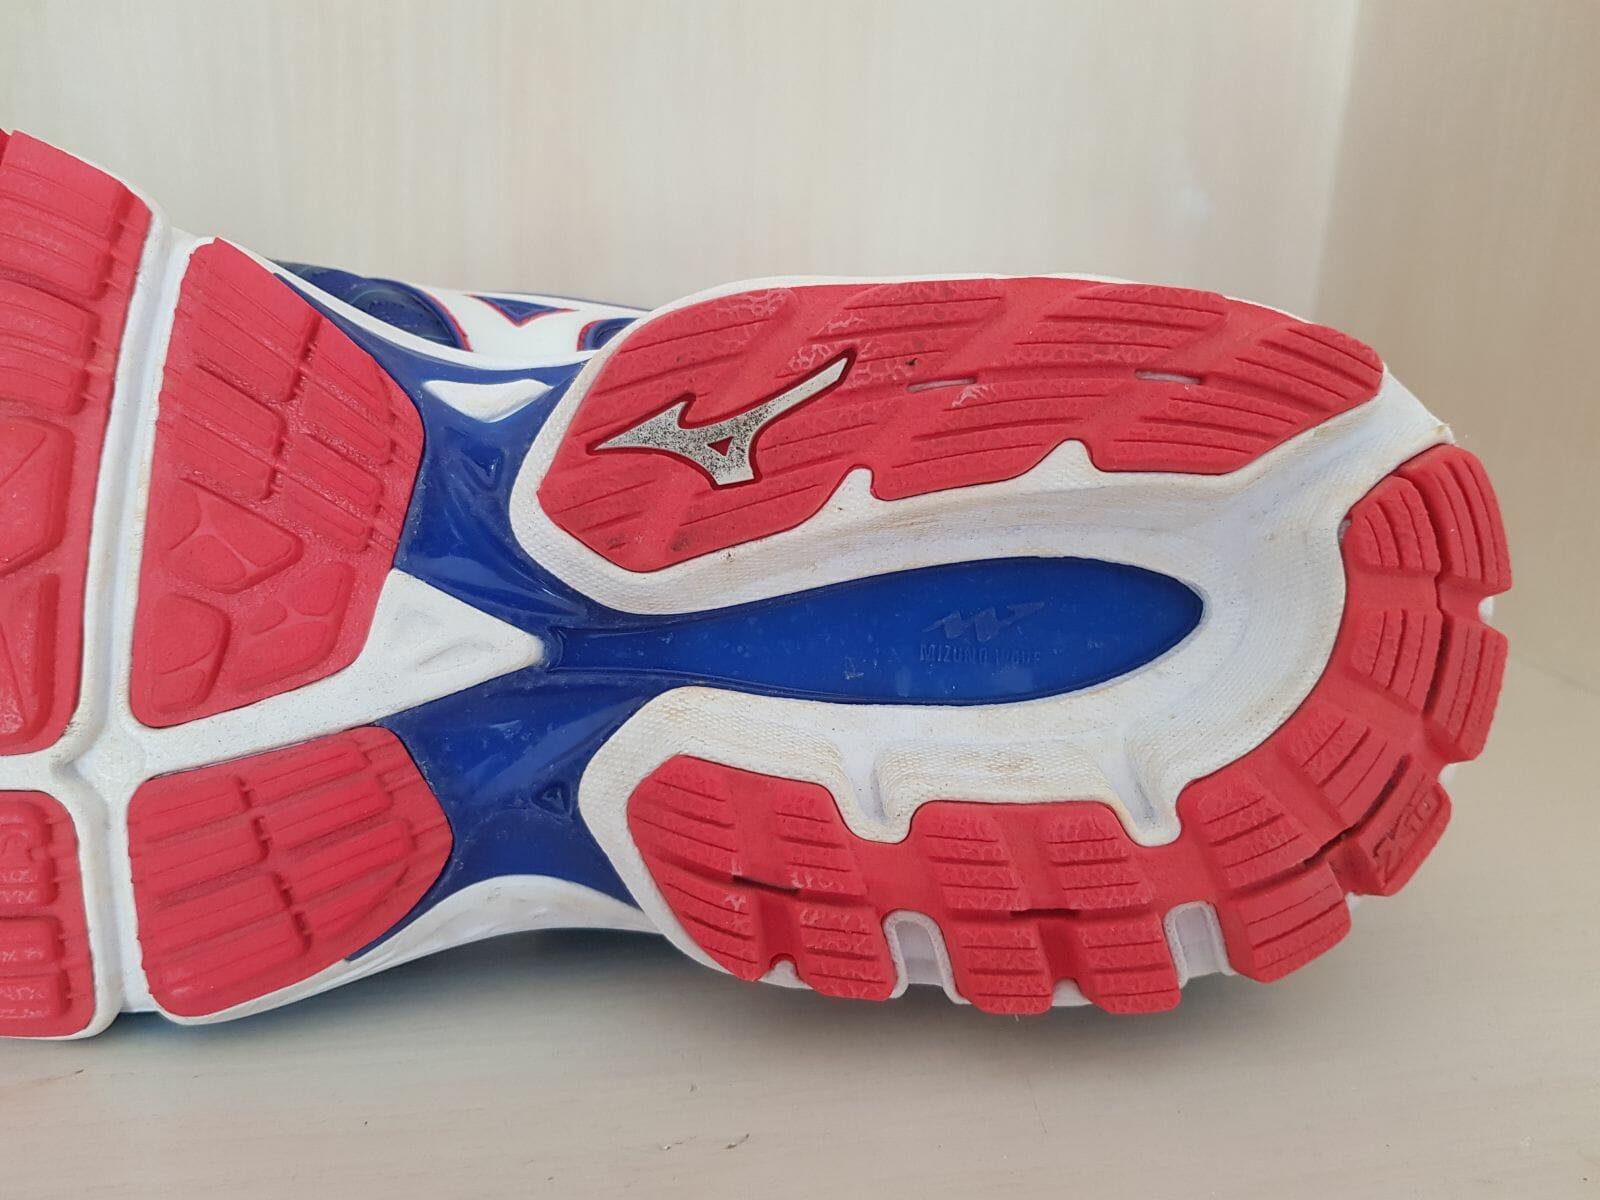 7d769a126d55 Mizuno Wave Inspire 14 Review | Running Shoes Guru